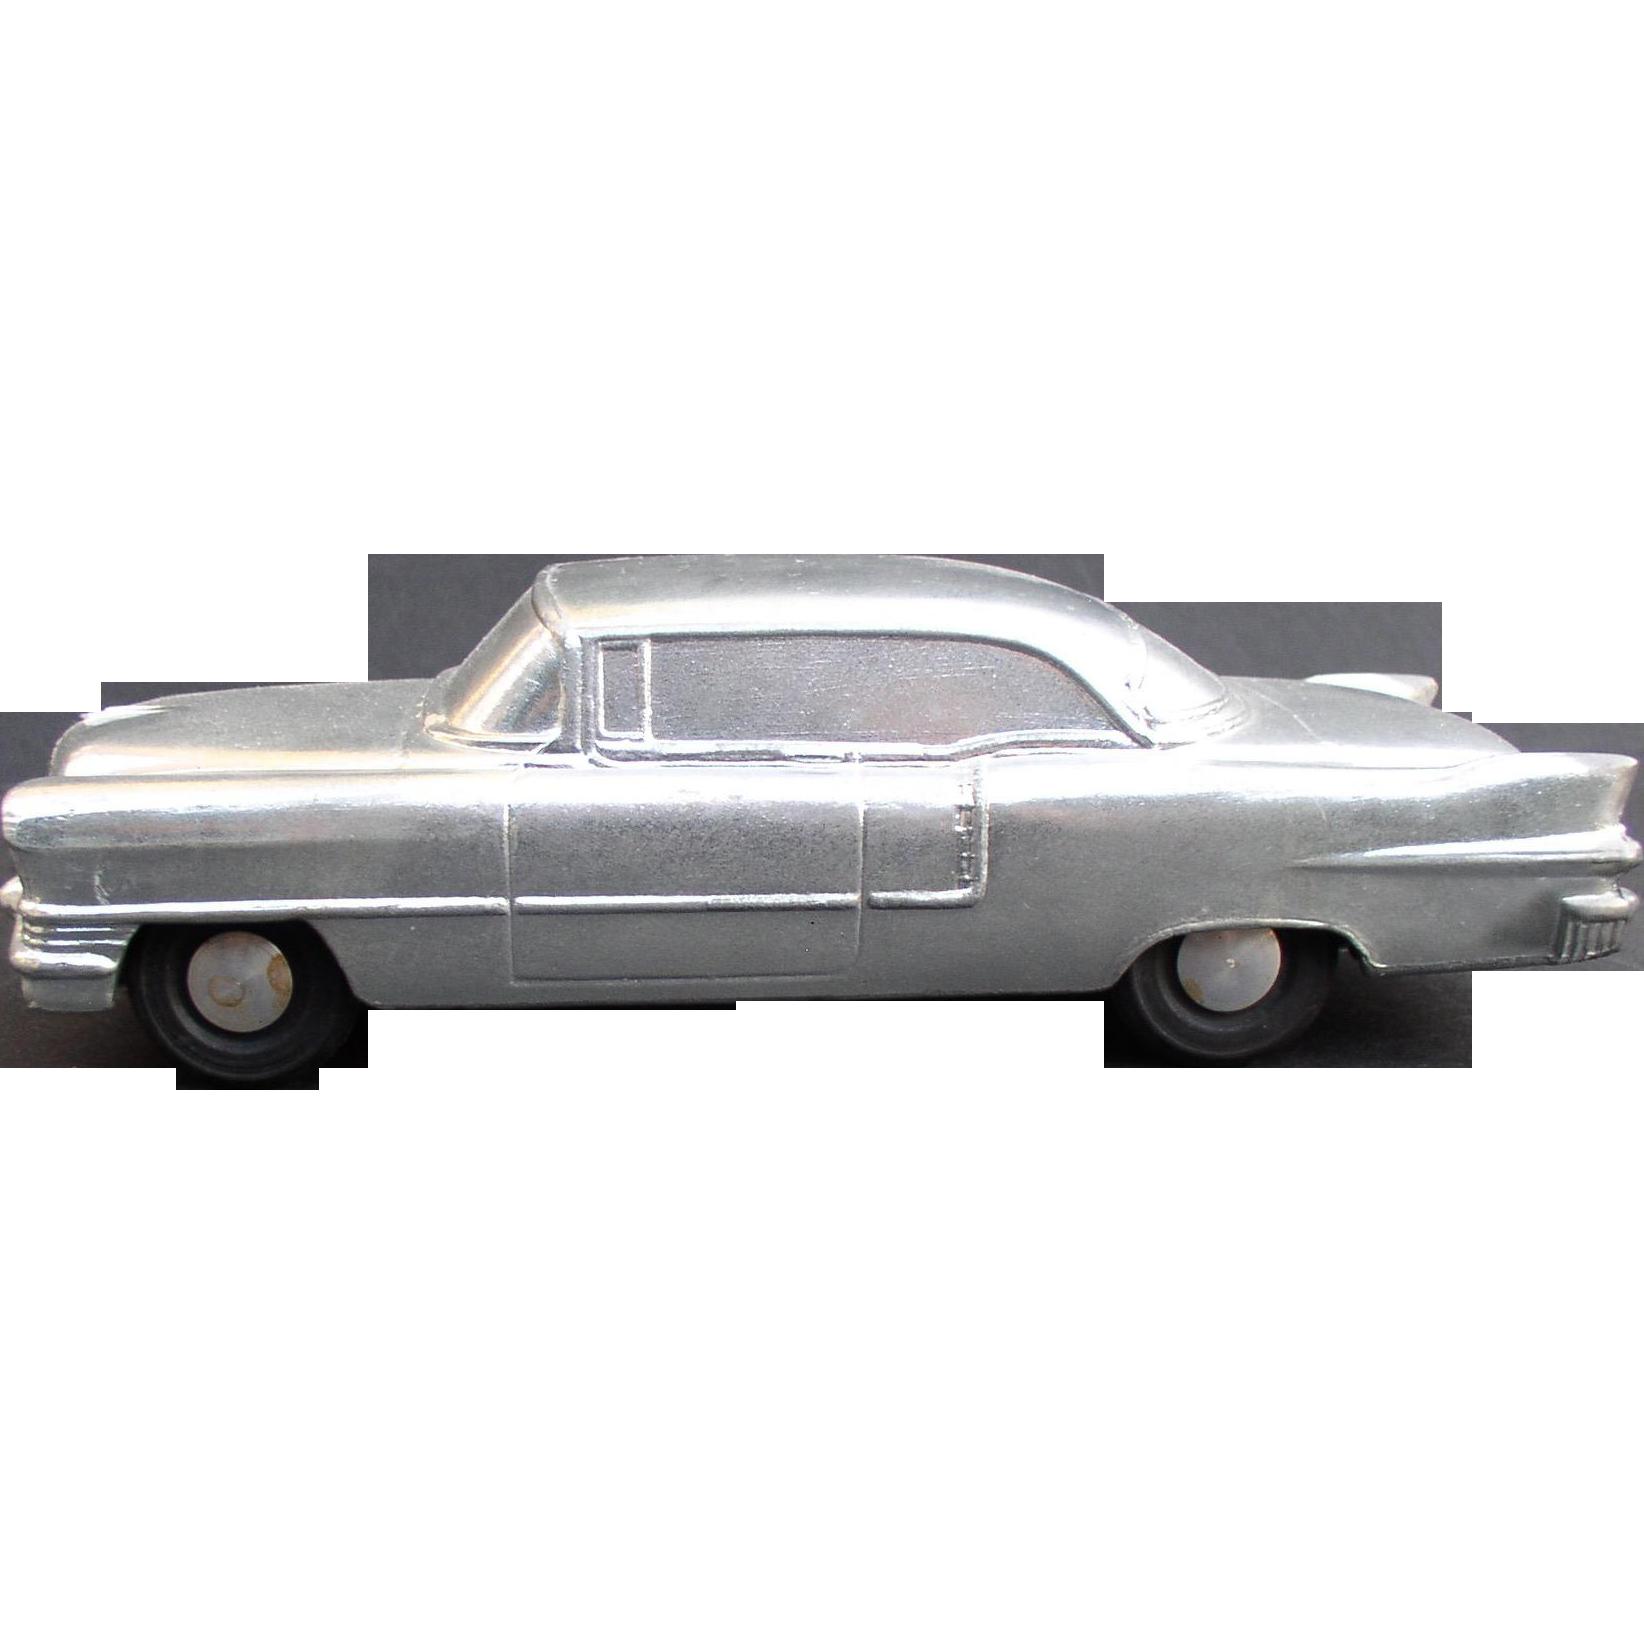 1957 Cadillac Coupe De Ville BANTHRICO Type Chicago ILL  Cast Steel Promo Car Bank